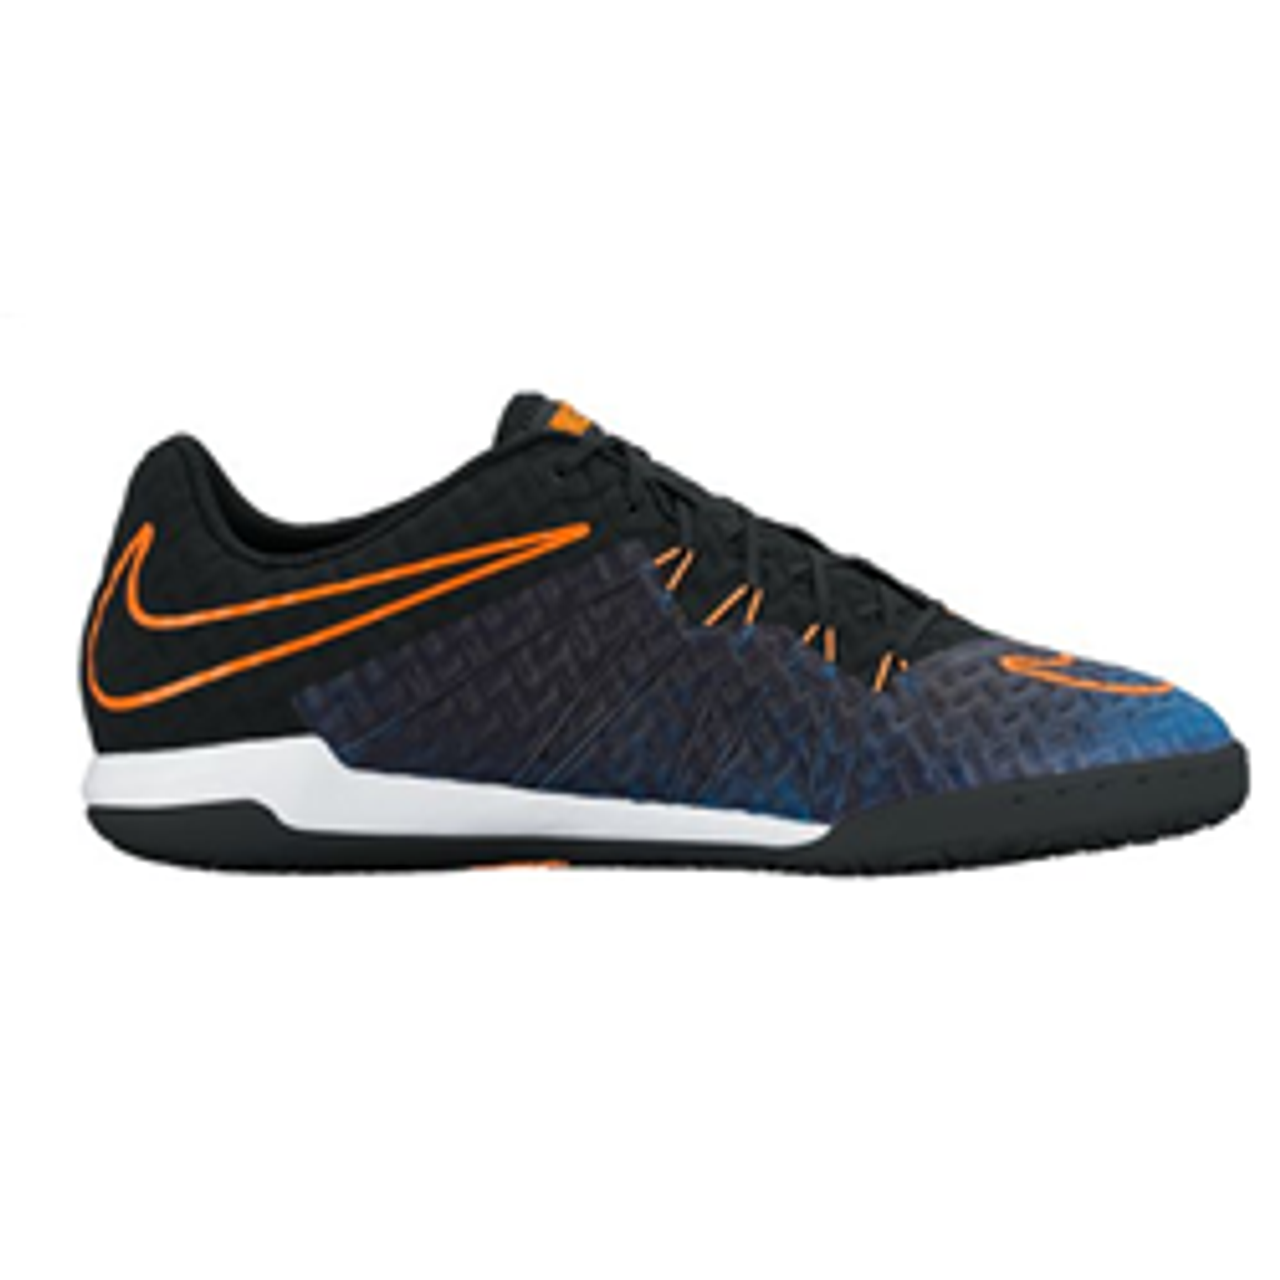 new concept 174f9 92f20 NIKE HYPERVENOMX FINALE IC indoor soccer shoes black/racer blue